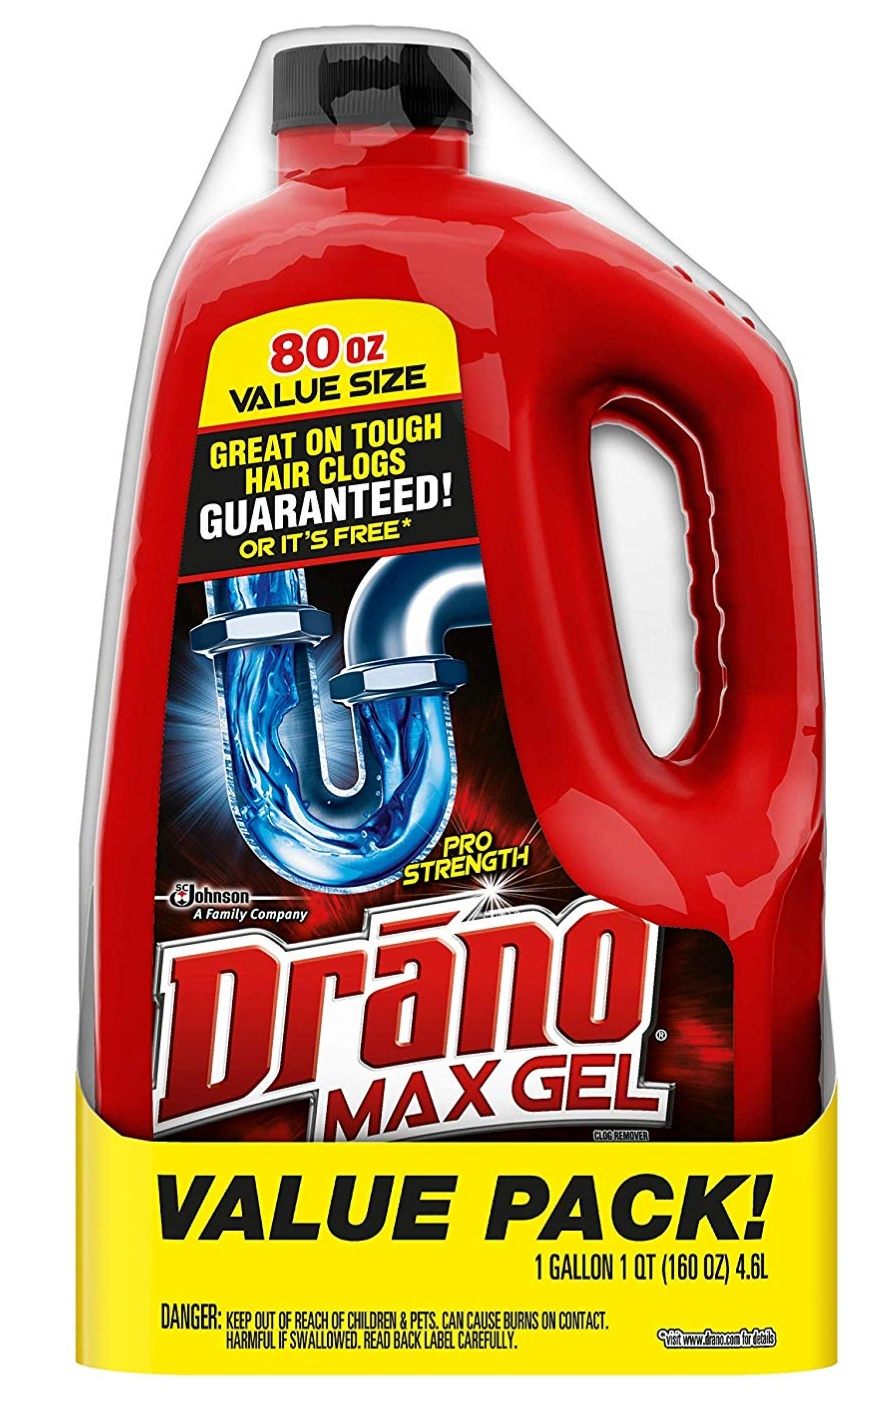 Drano Max Gel 80Oz 액체 뚫어뻥